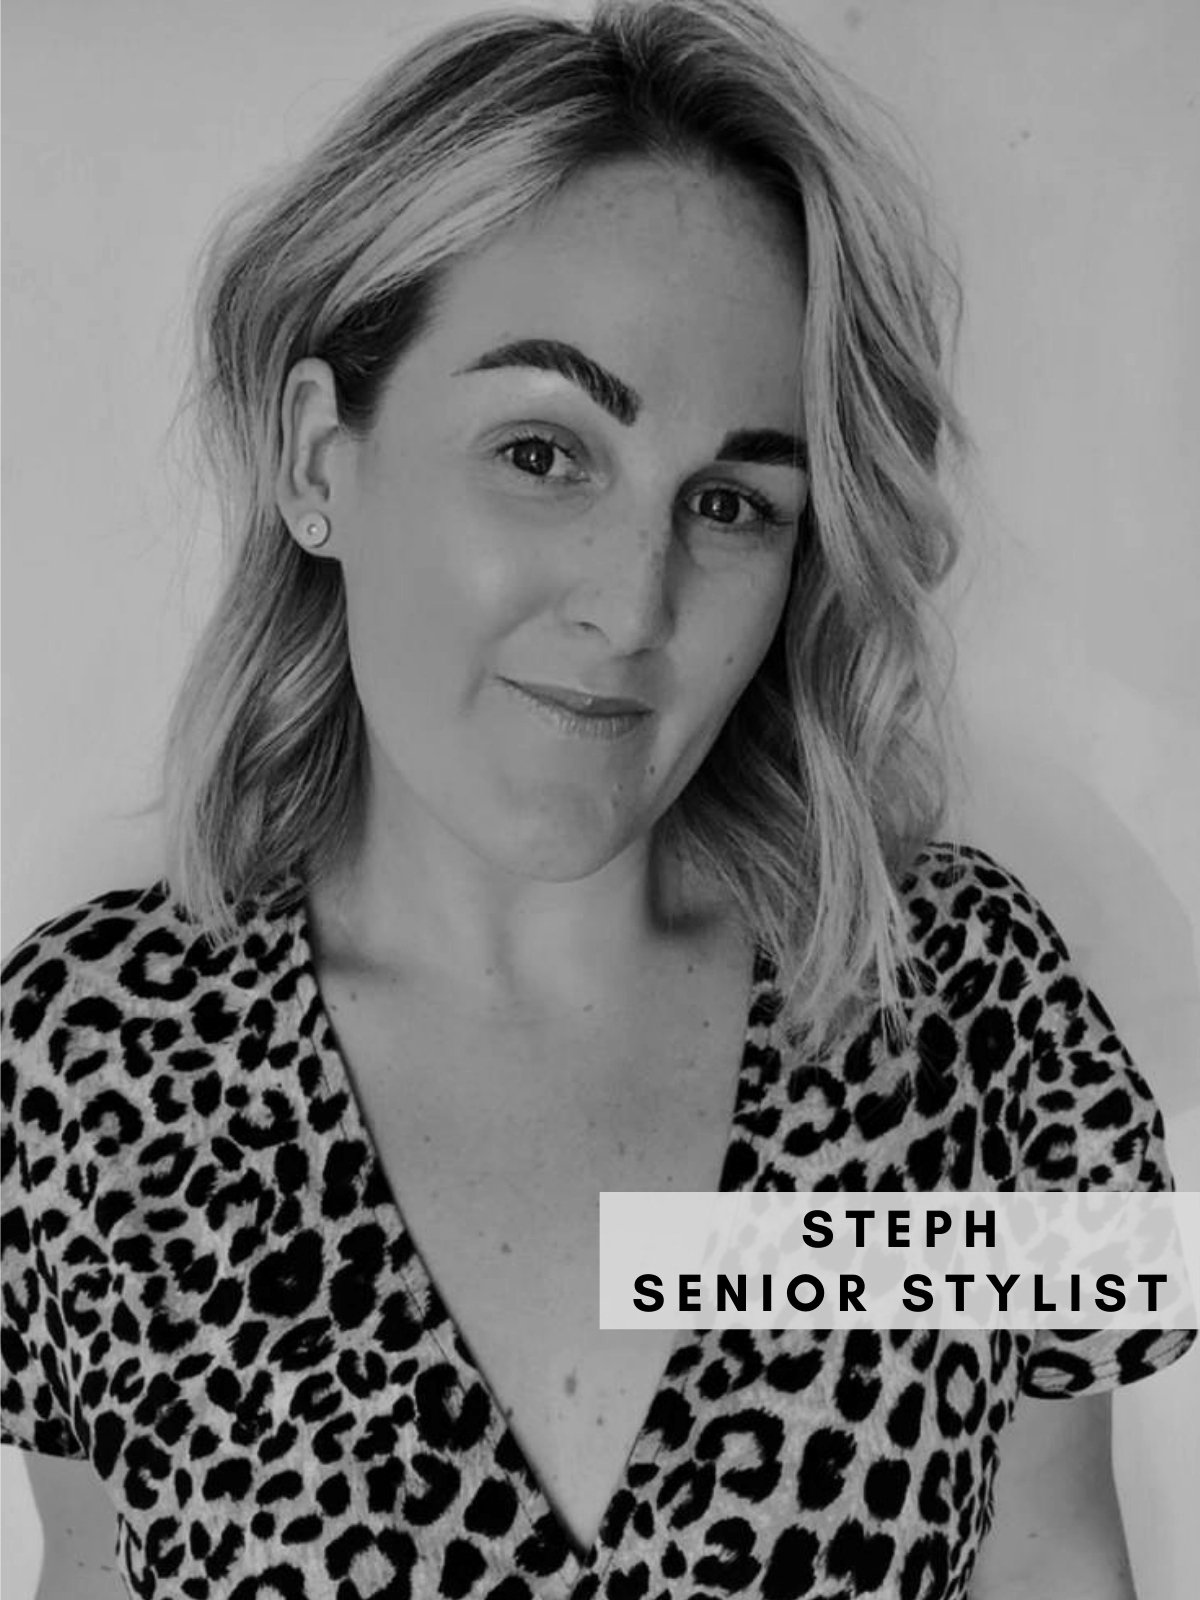 Steph – Senior Stylist